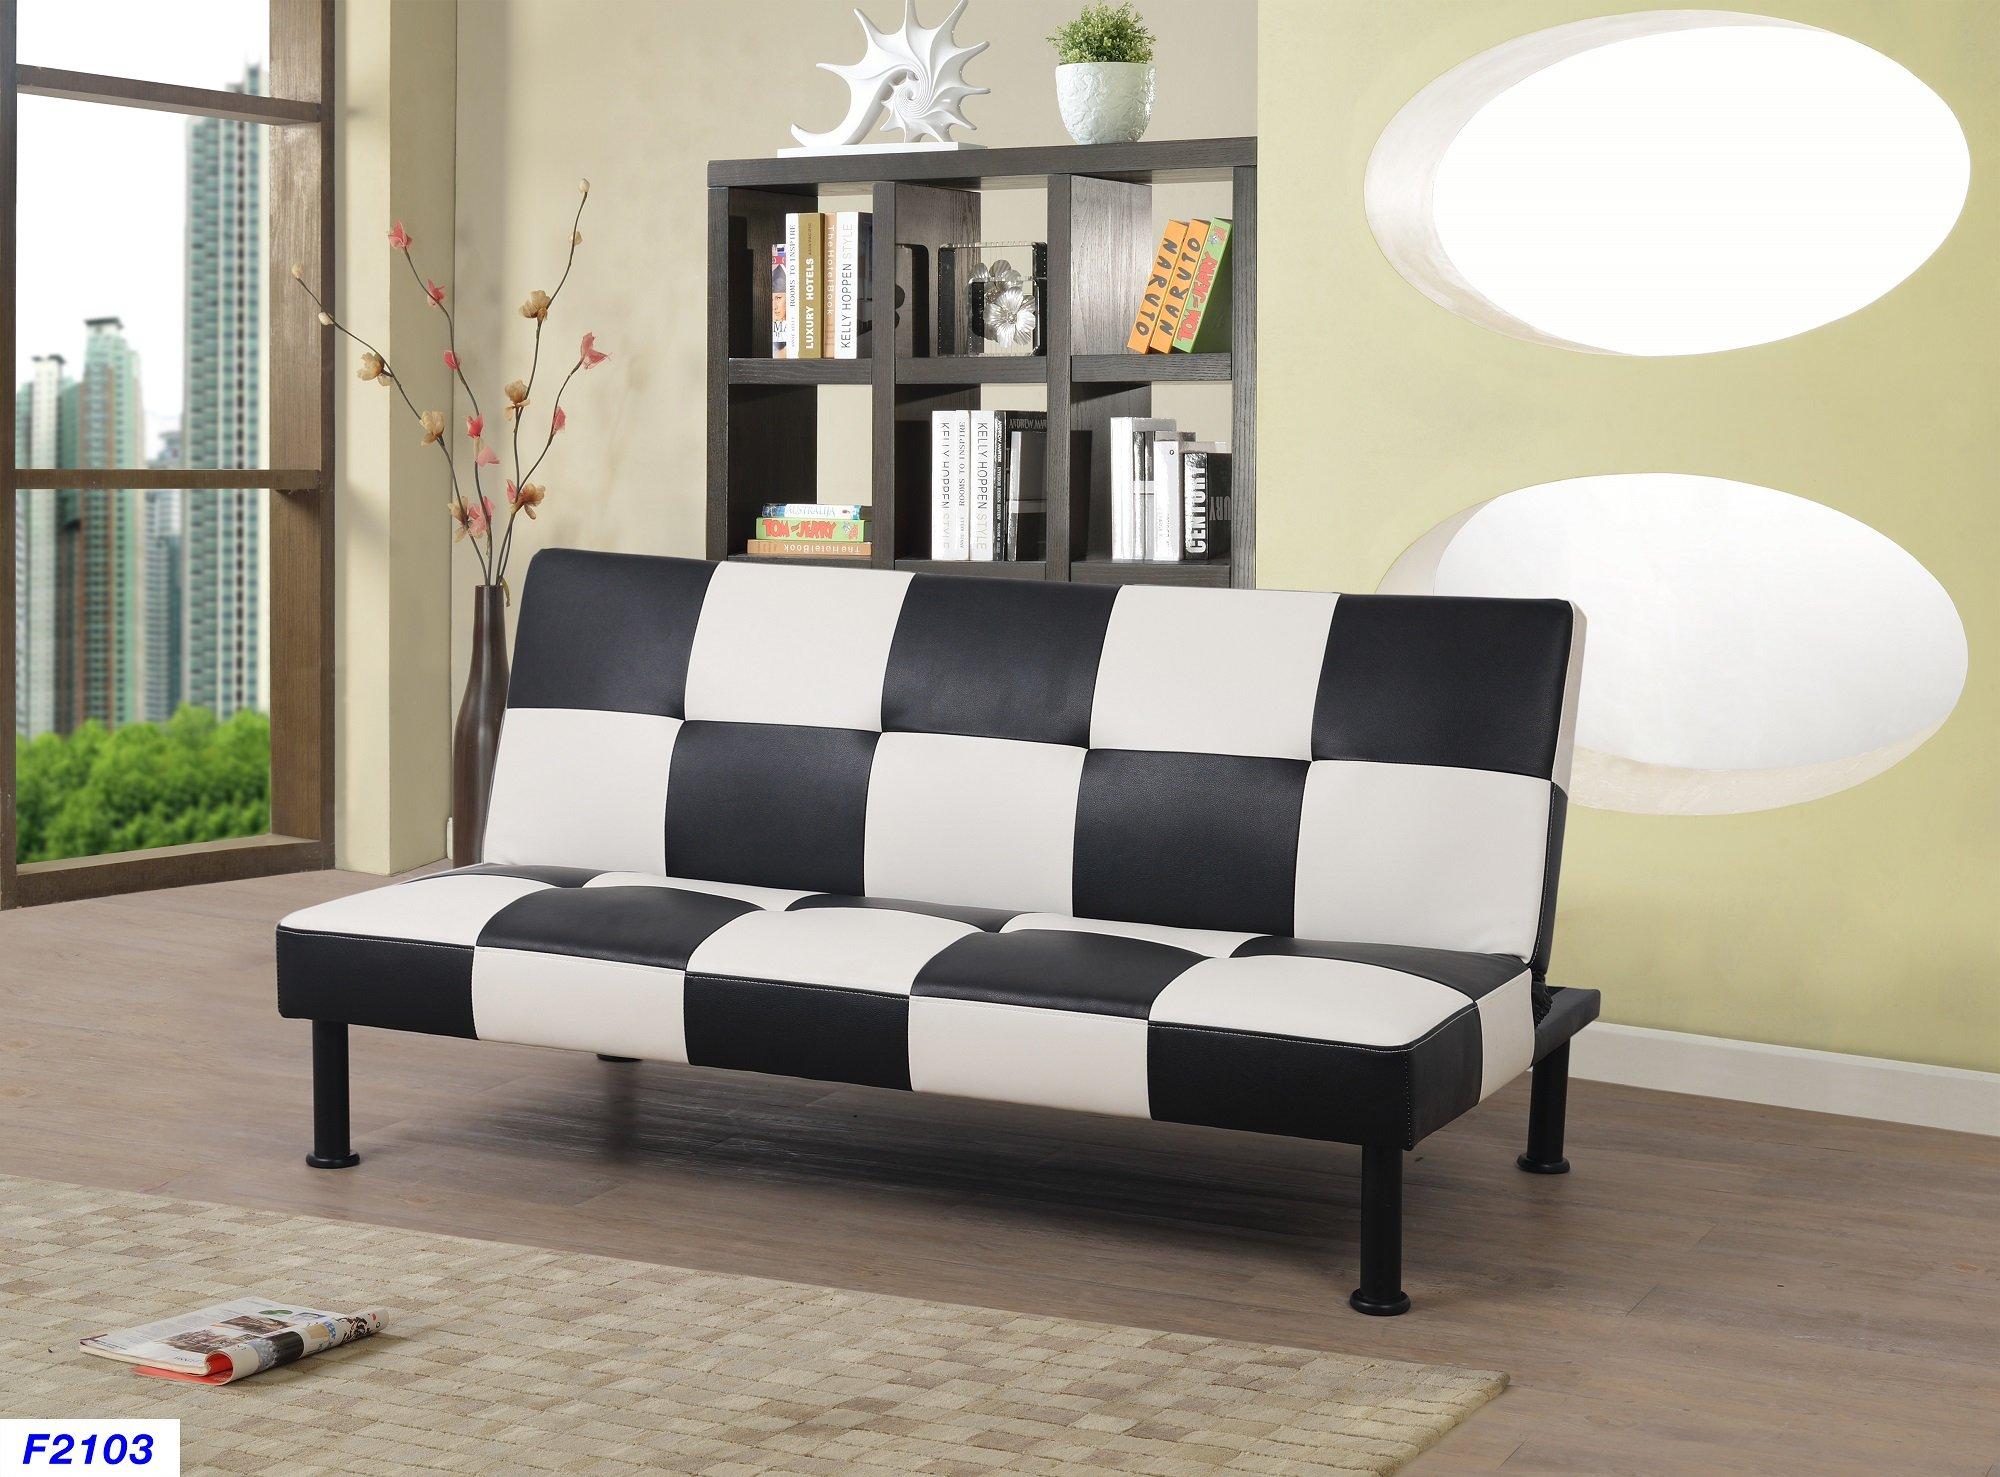 Beverly Fine Furniture F2103 Checkered Futon Sofa Bed, Black by Beverly Fine Furniture